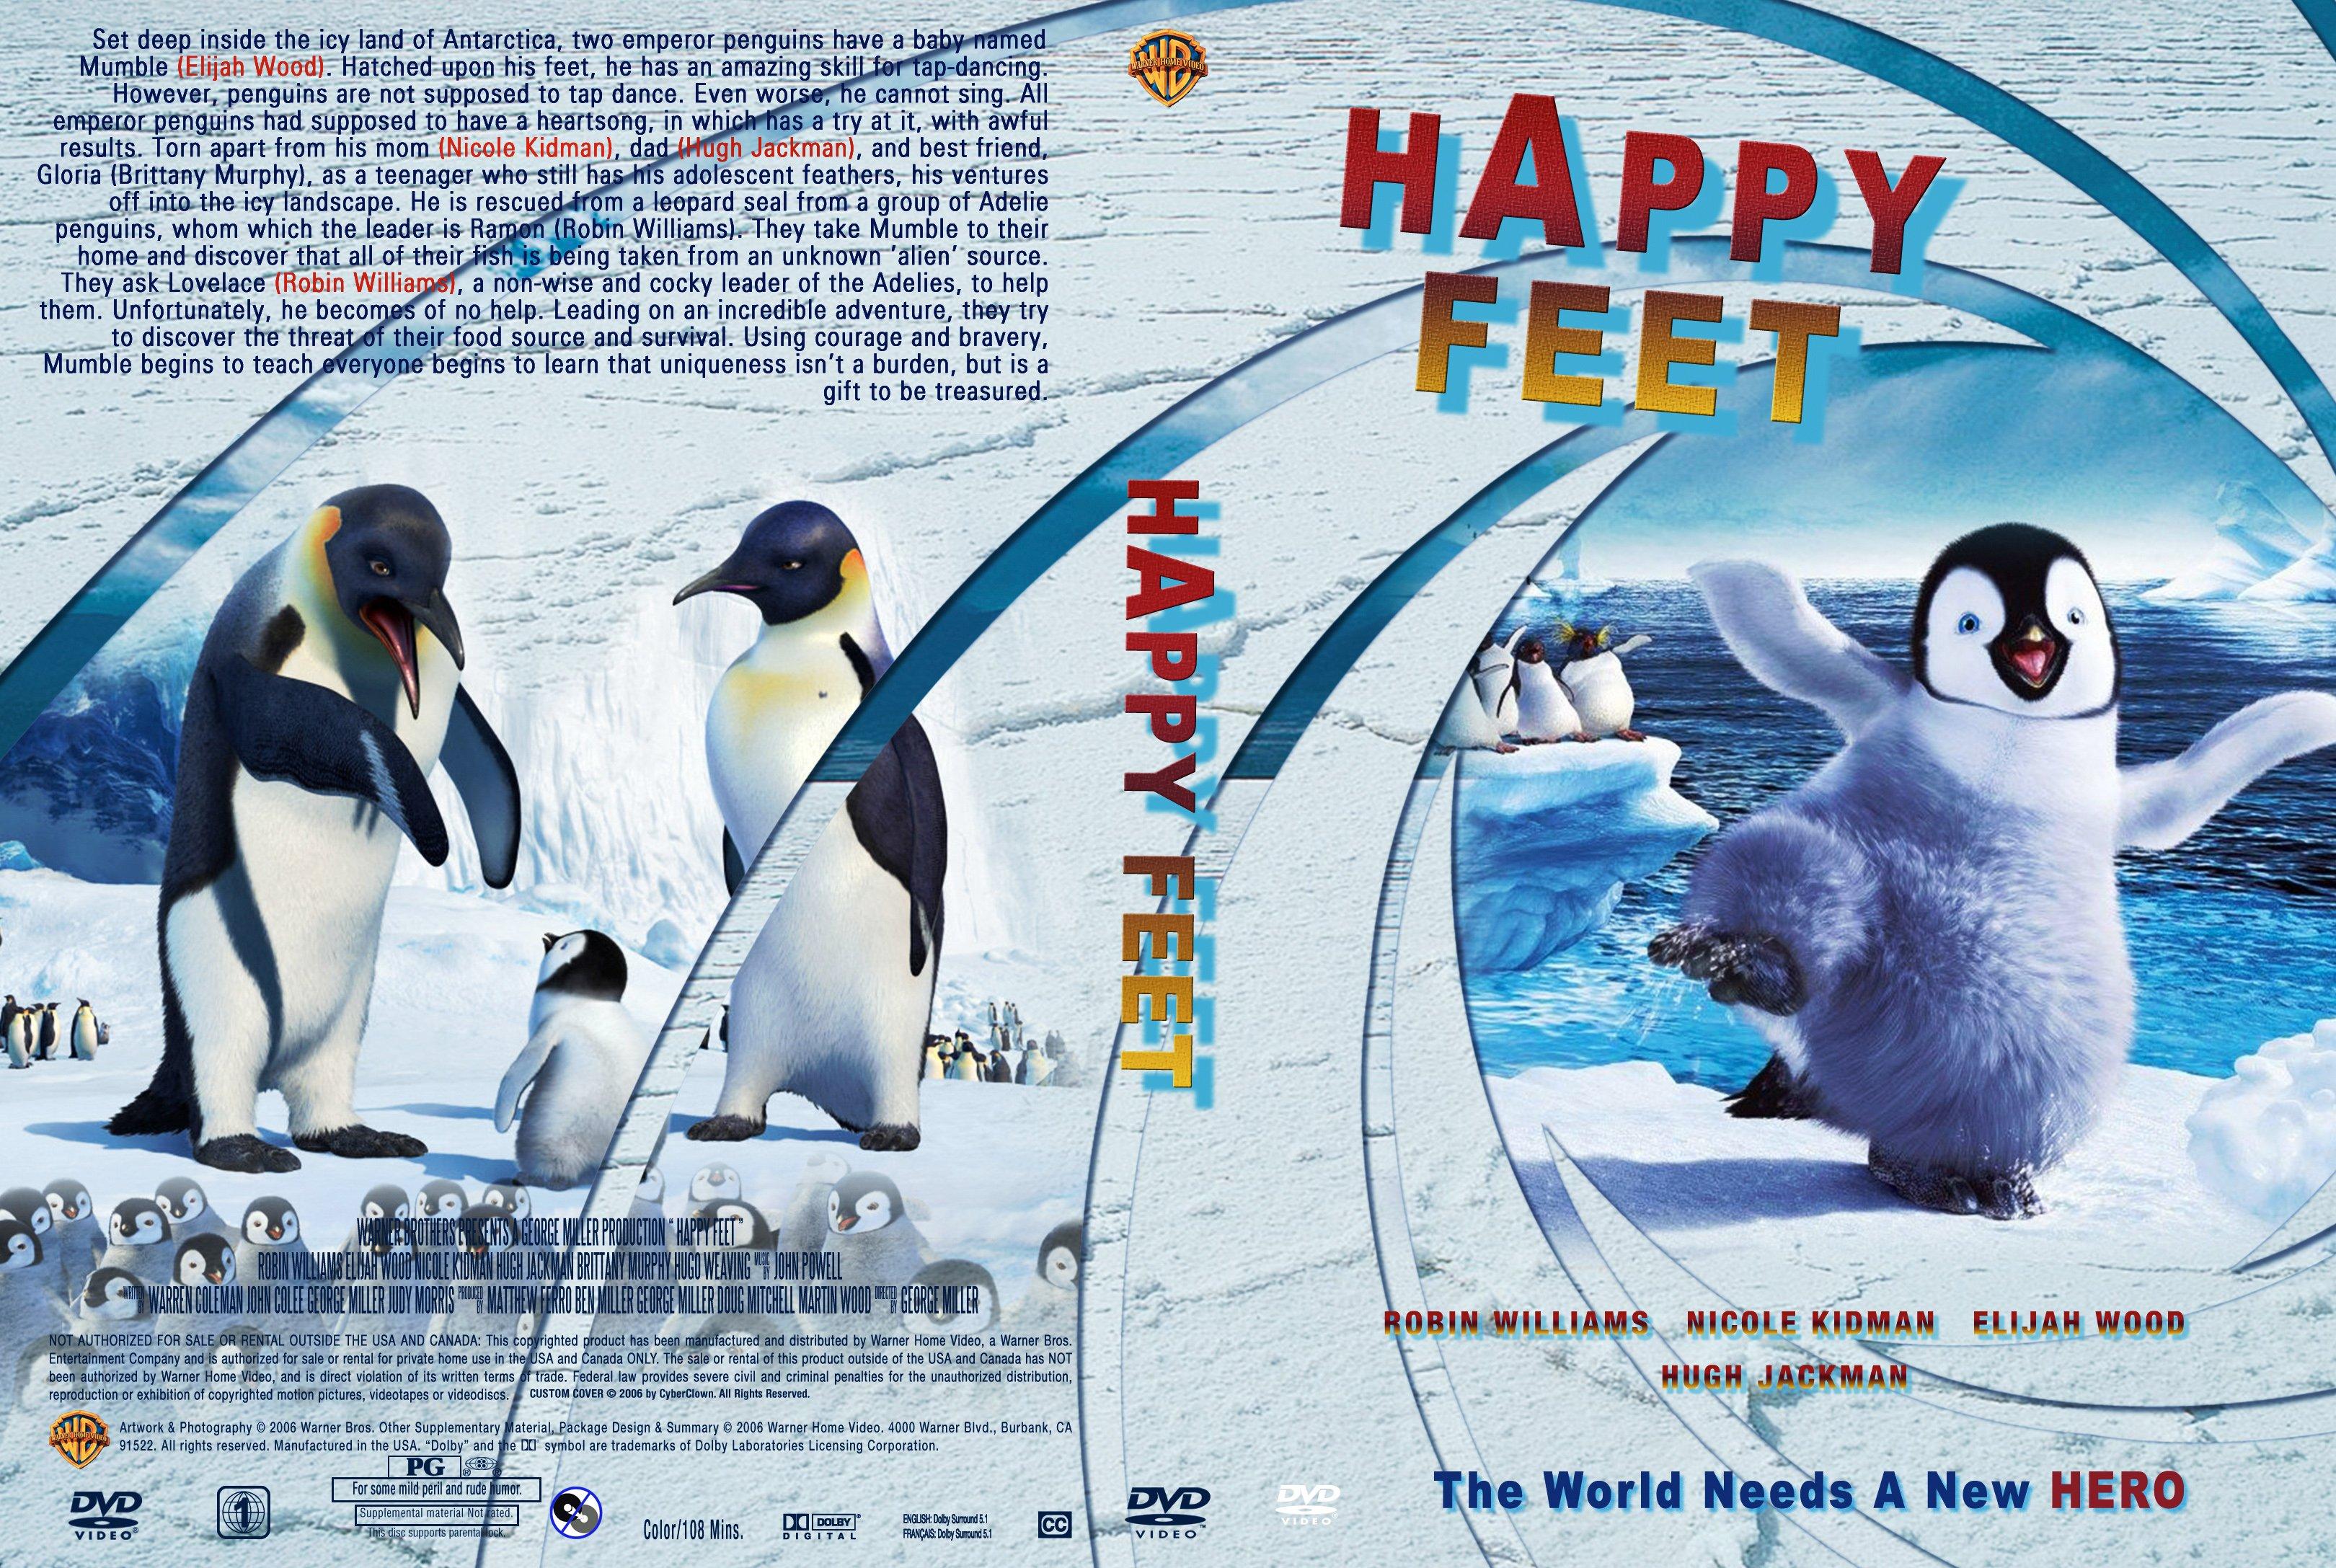 happy feet 1 movie download